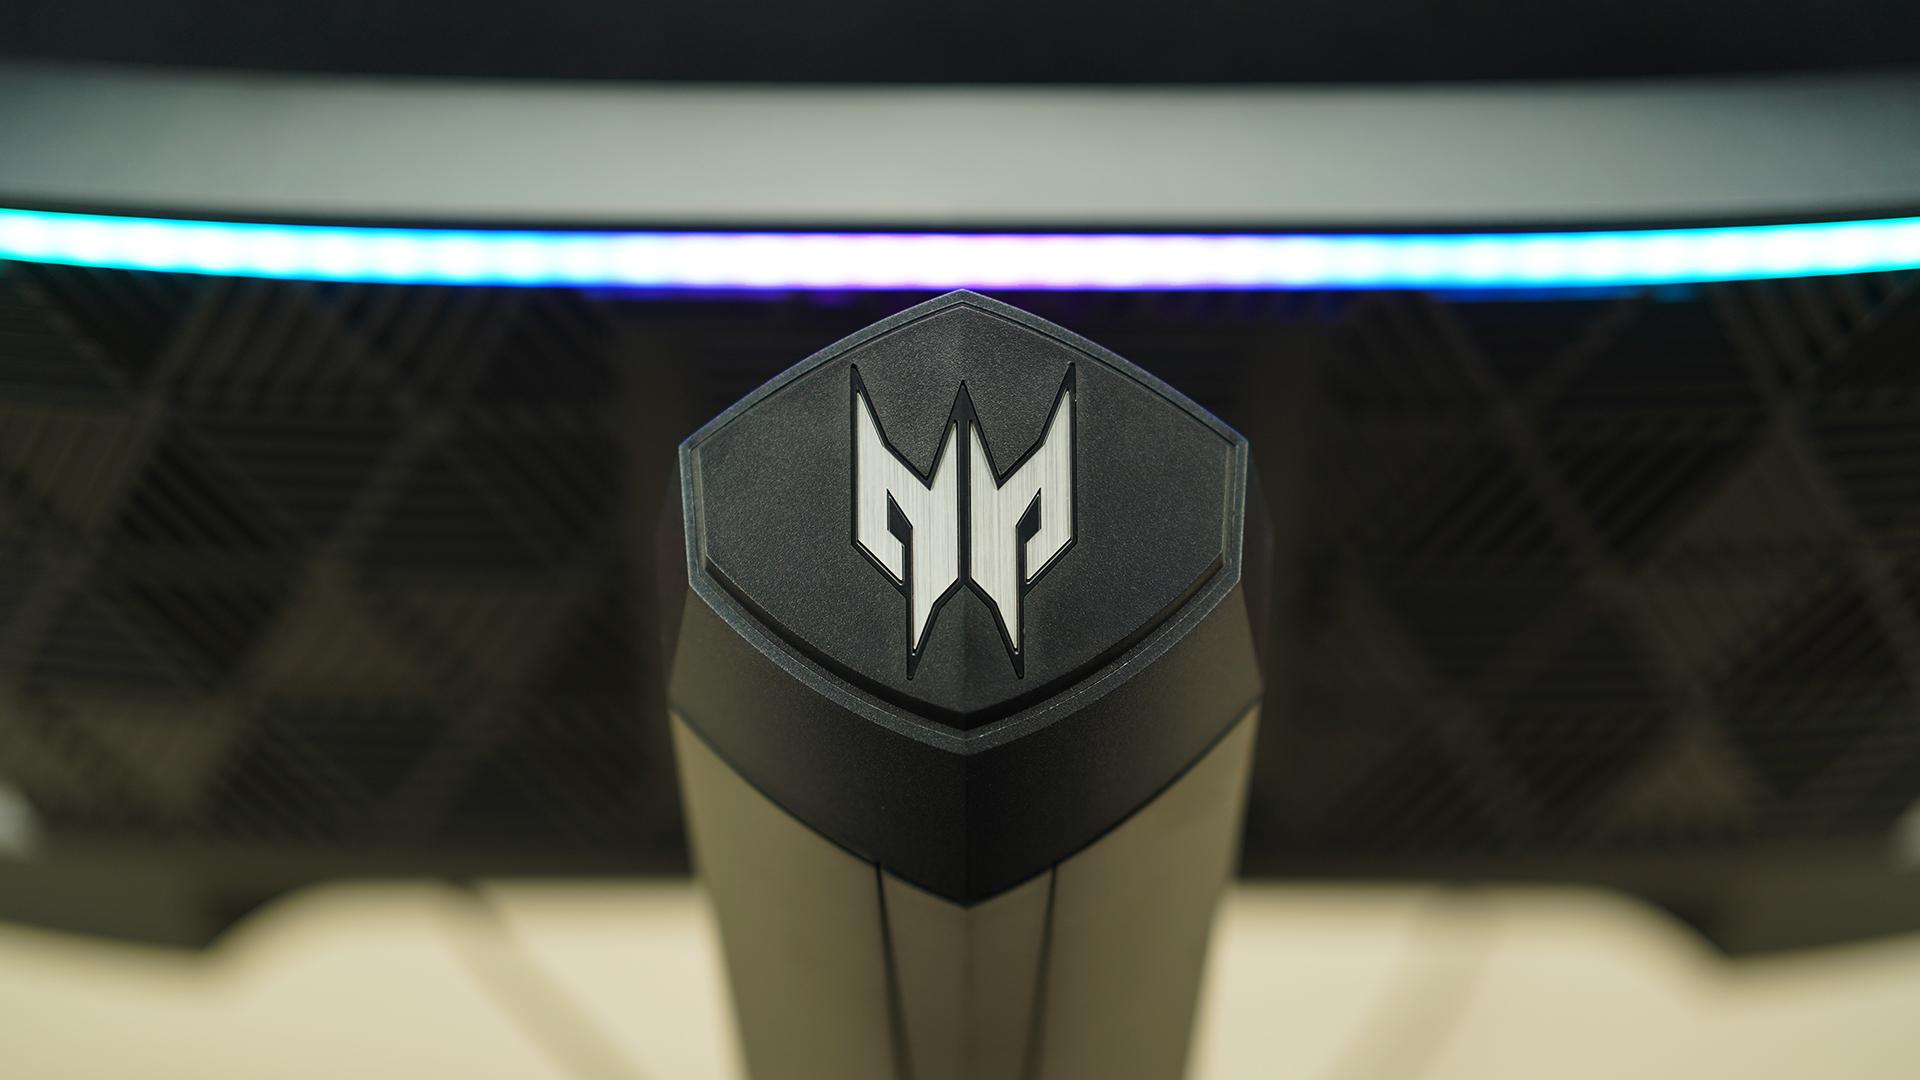 Acer Predator X25 - Design 6 Standfuss